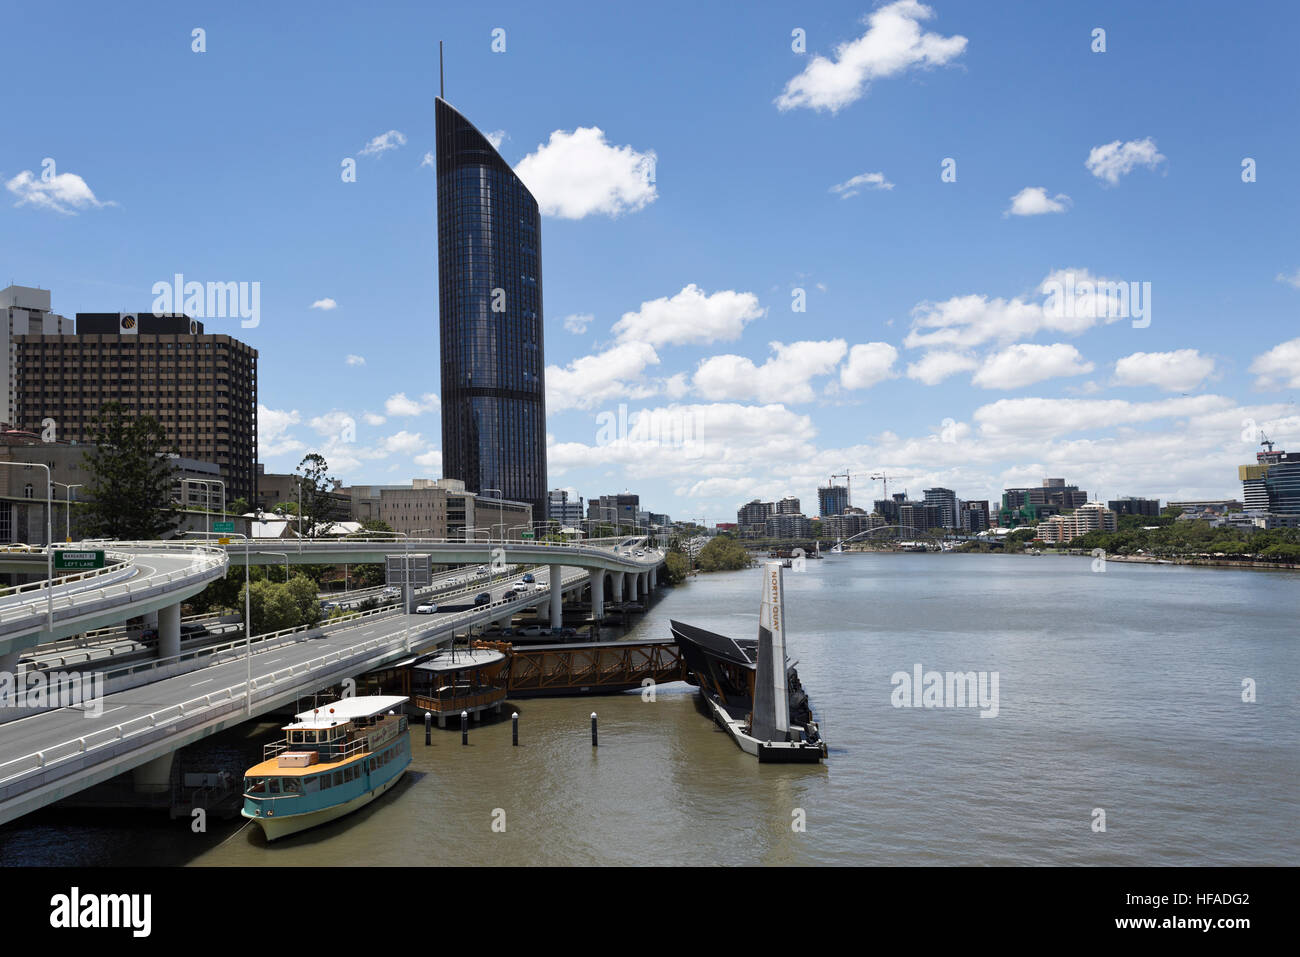 Panoramic view of the modern city of Brisbane, Australia - Stock Image